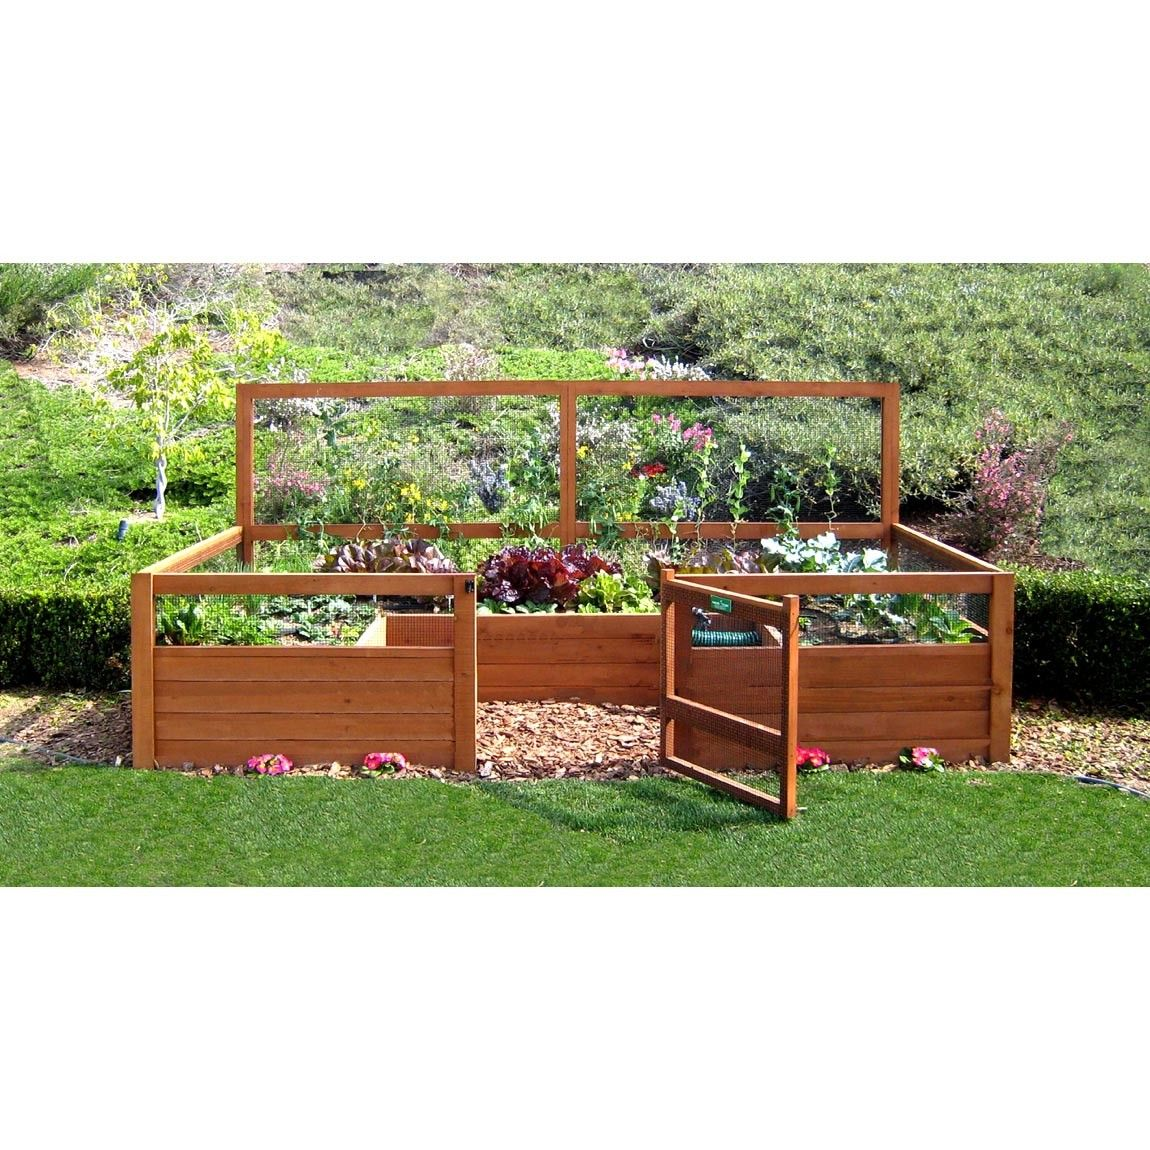 Cedar Complete Raised Garden Bed Kit 8' x 12' Small